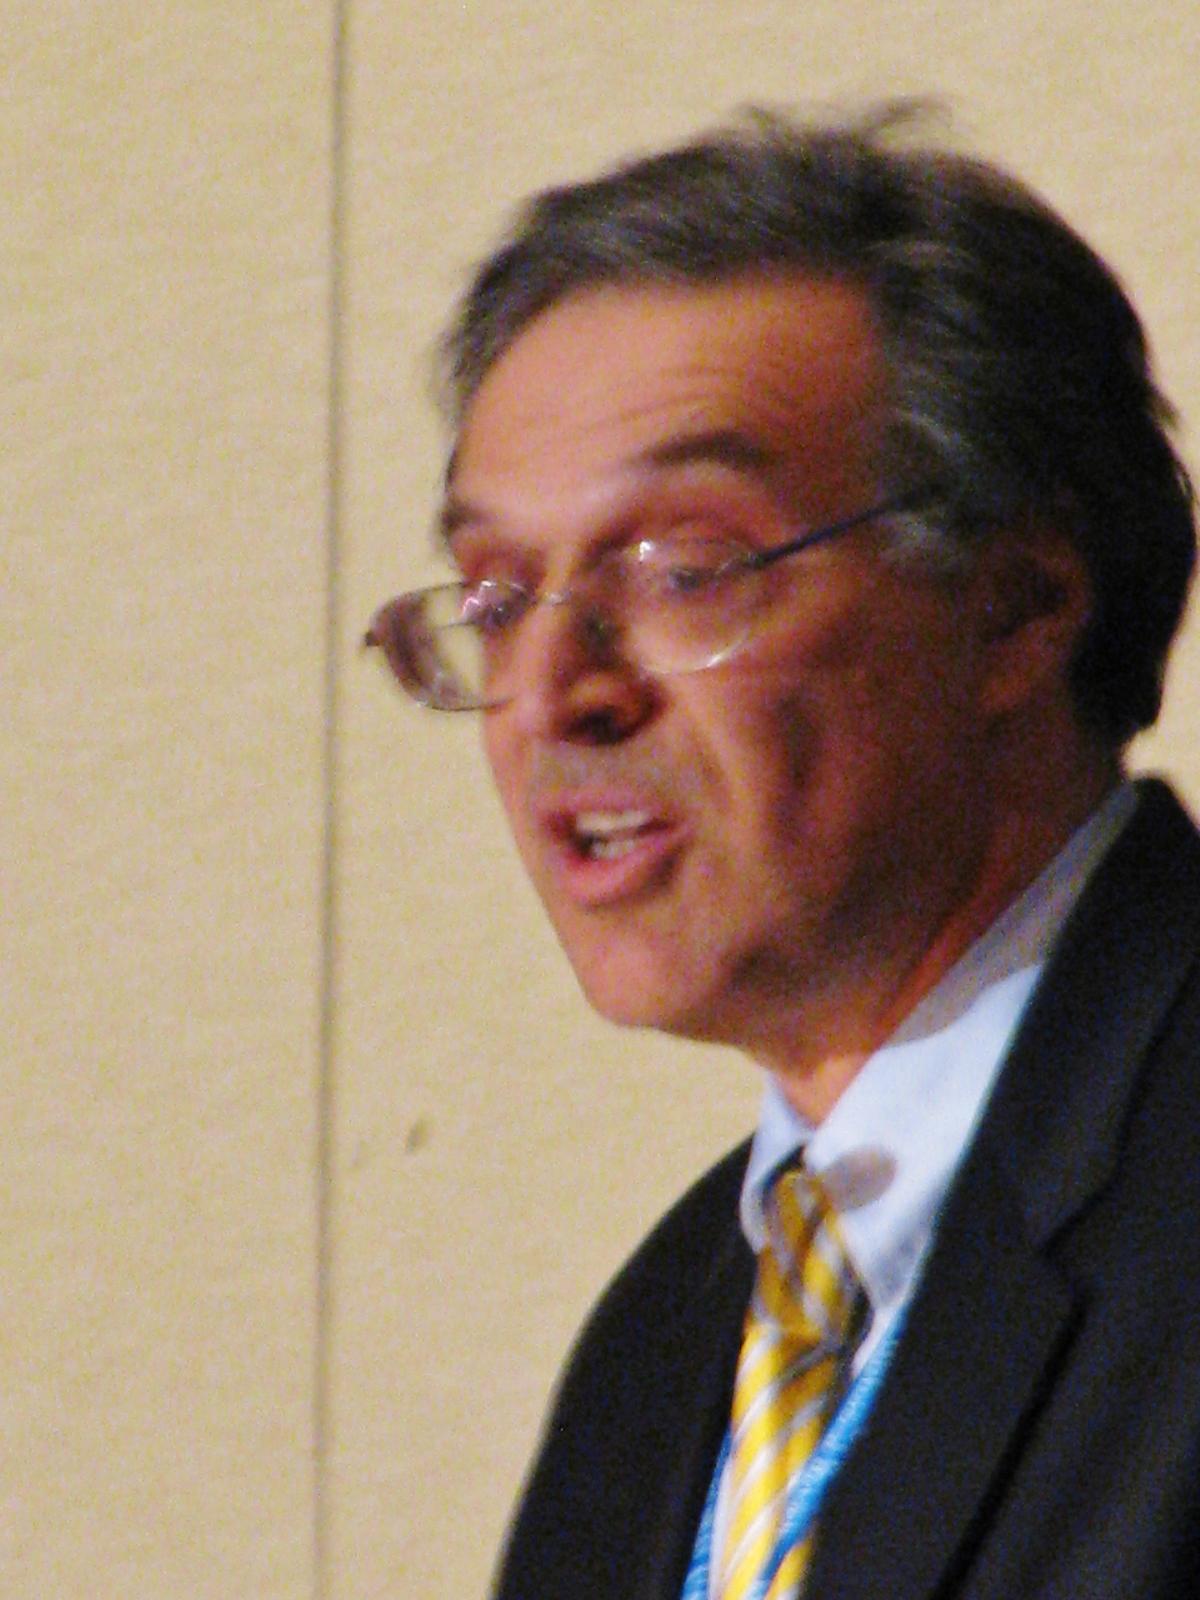 At American Historical Association 2014